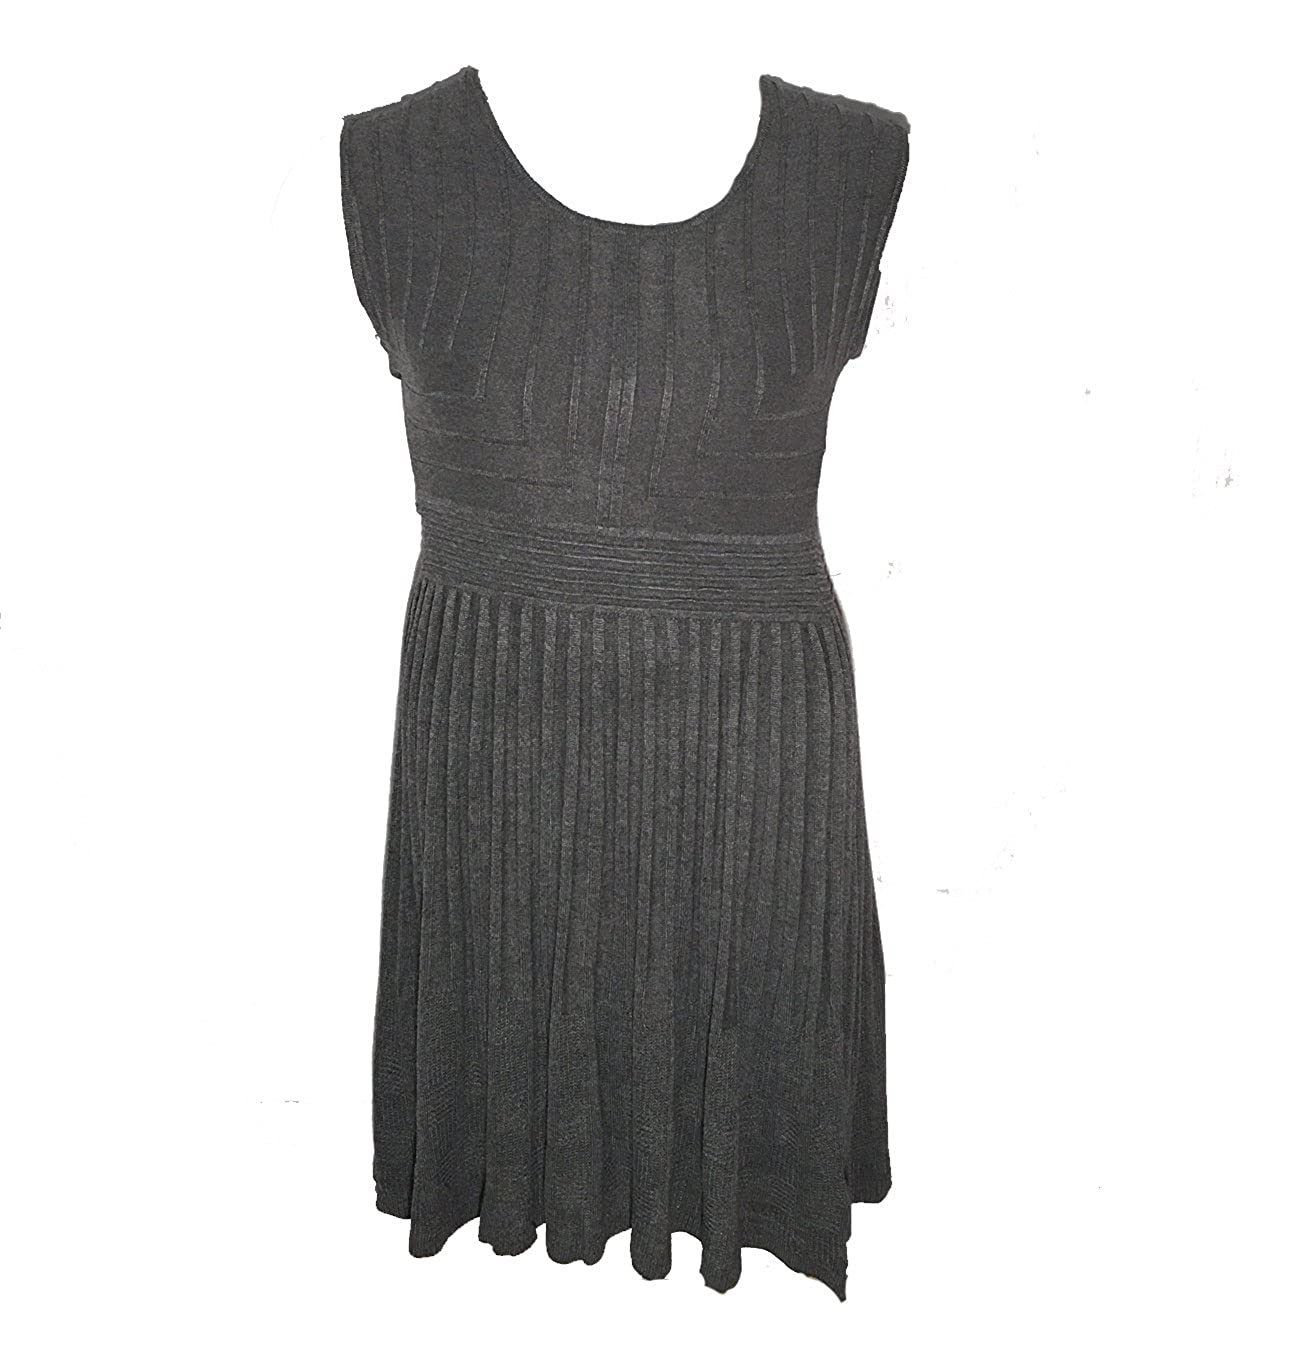 e41885cd5f11 Amazon.com  Ella Moss Girls  Slim Size Lorie Sweater Dress